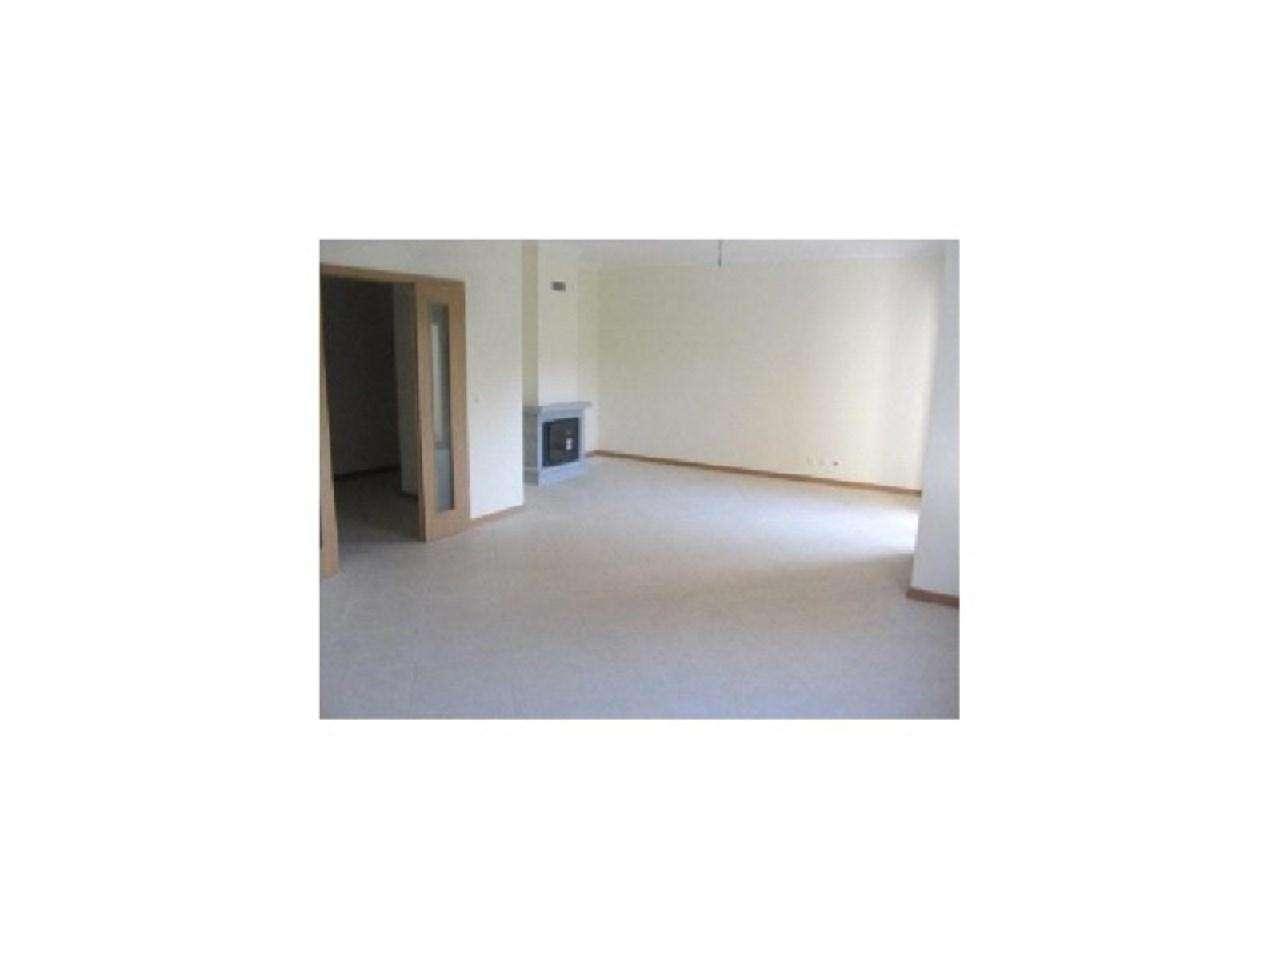 Apartamento para comprar, Caria, Castelo Branco - Foto 1